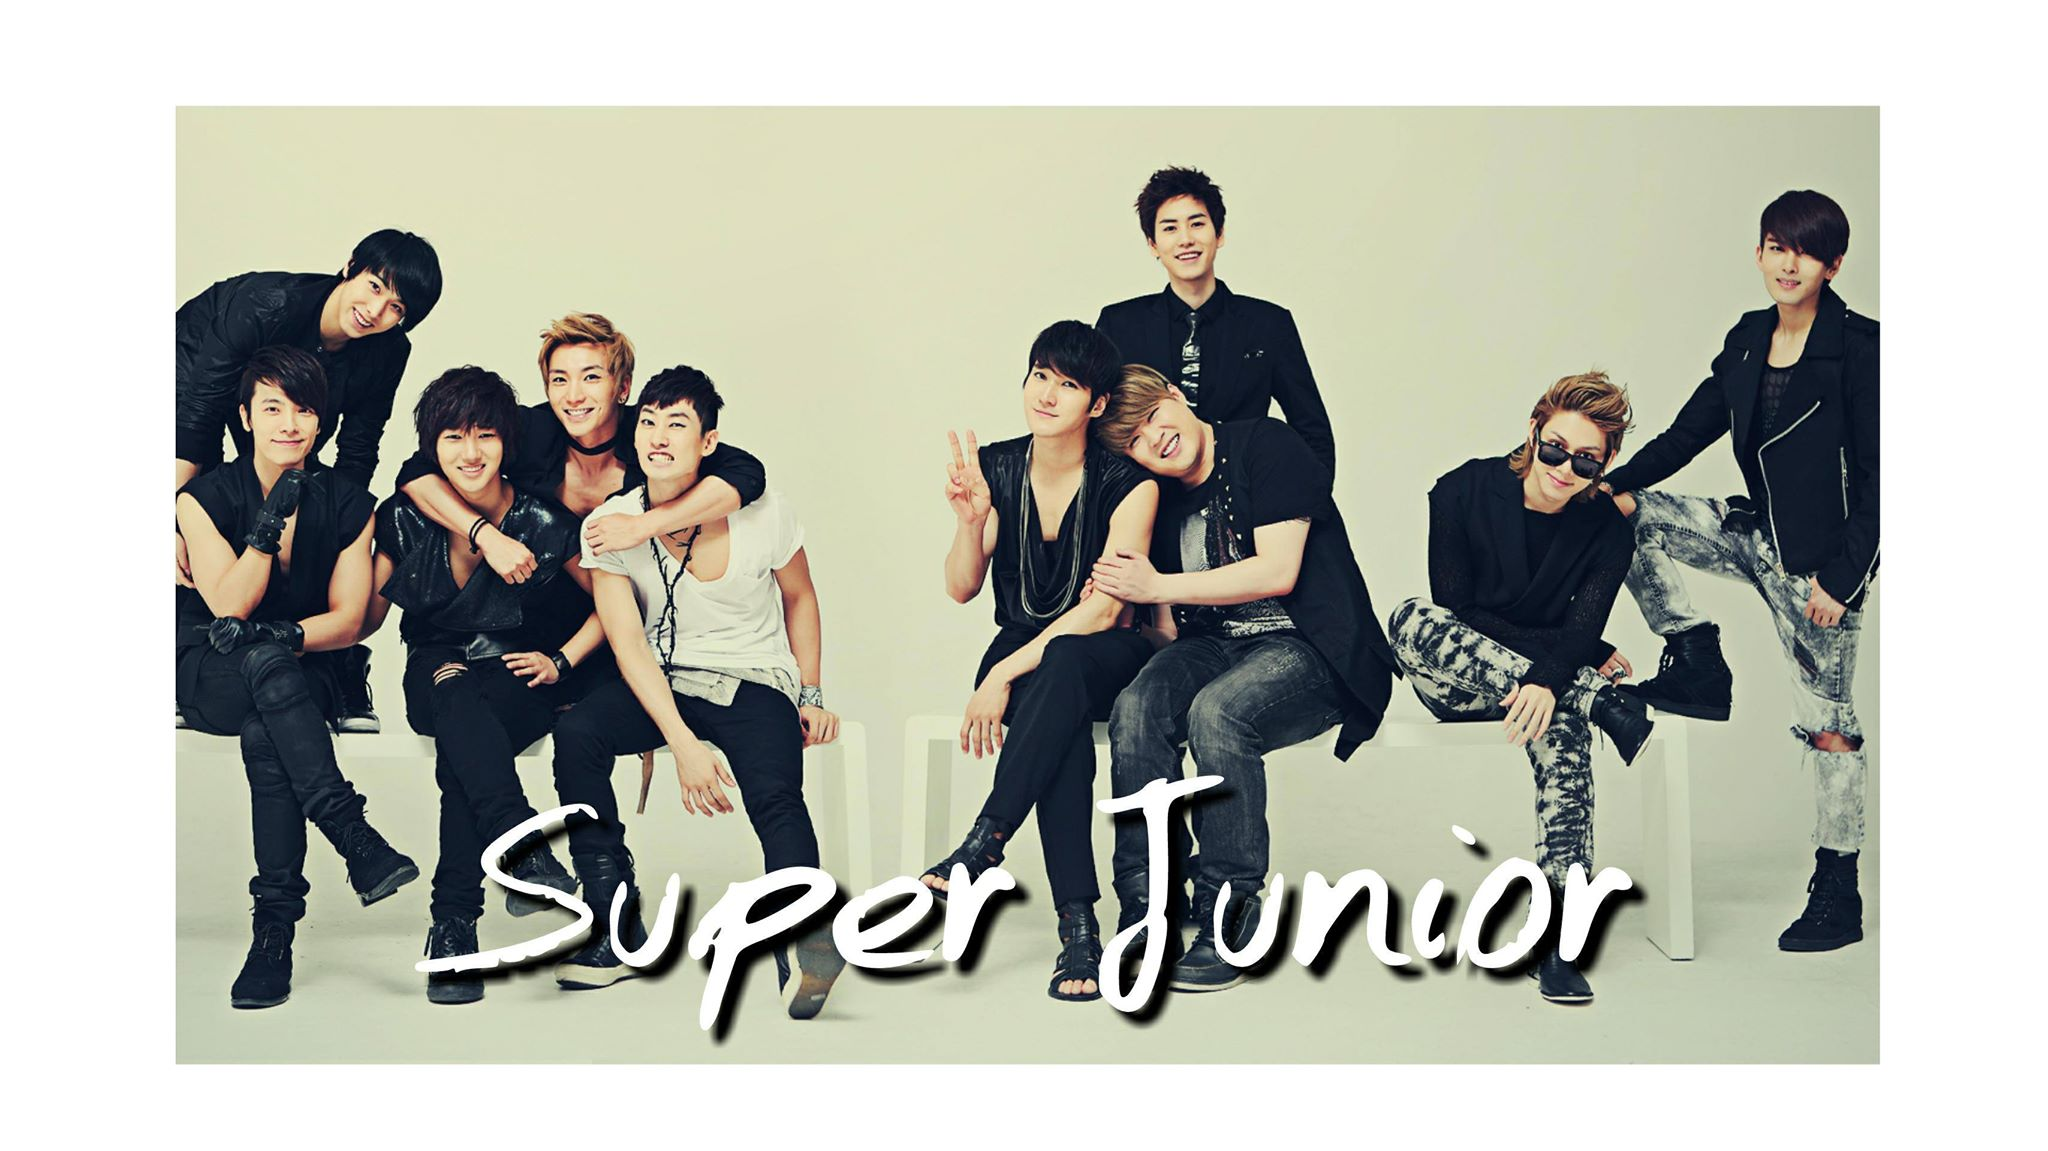 韓團故事特輯 Part 1 - Super Junior